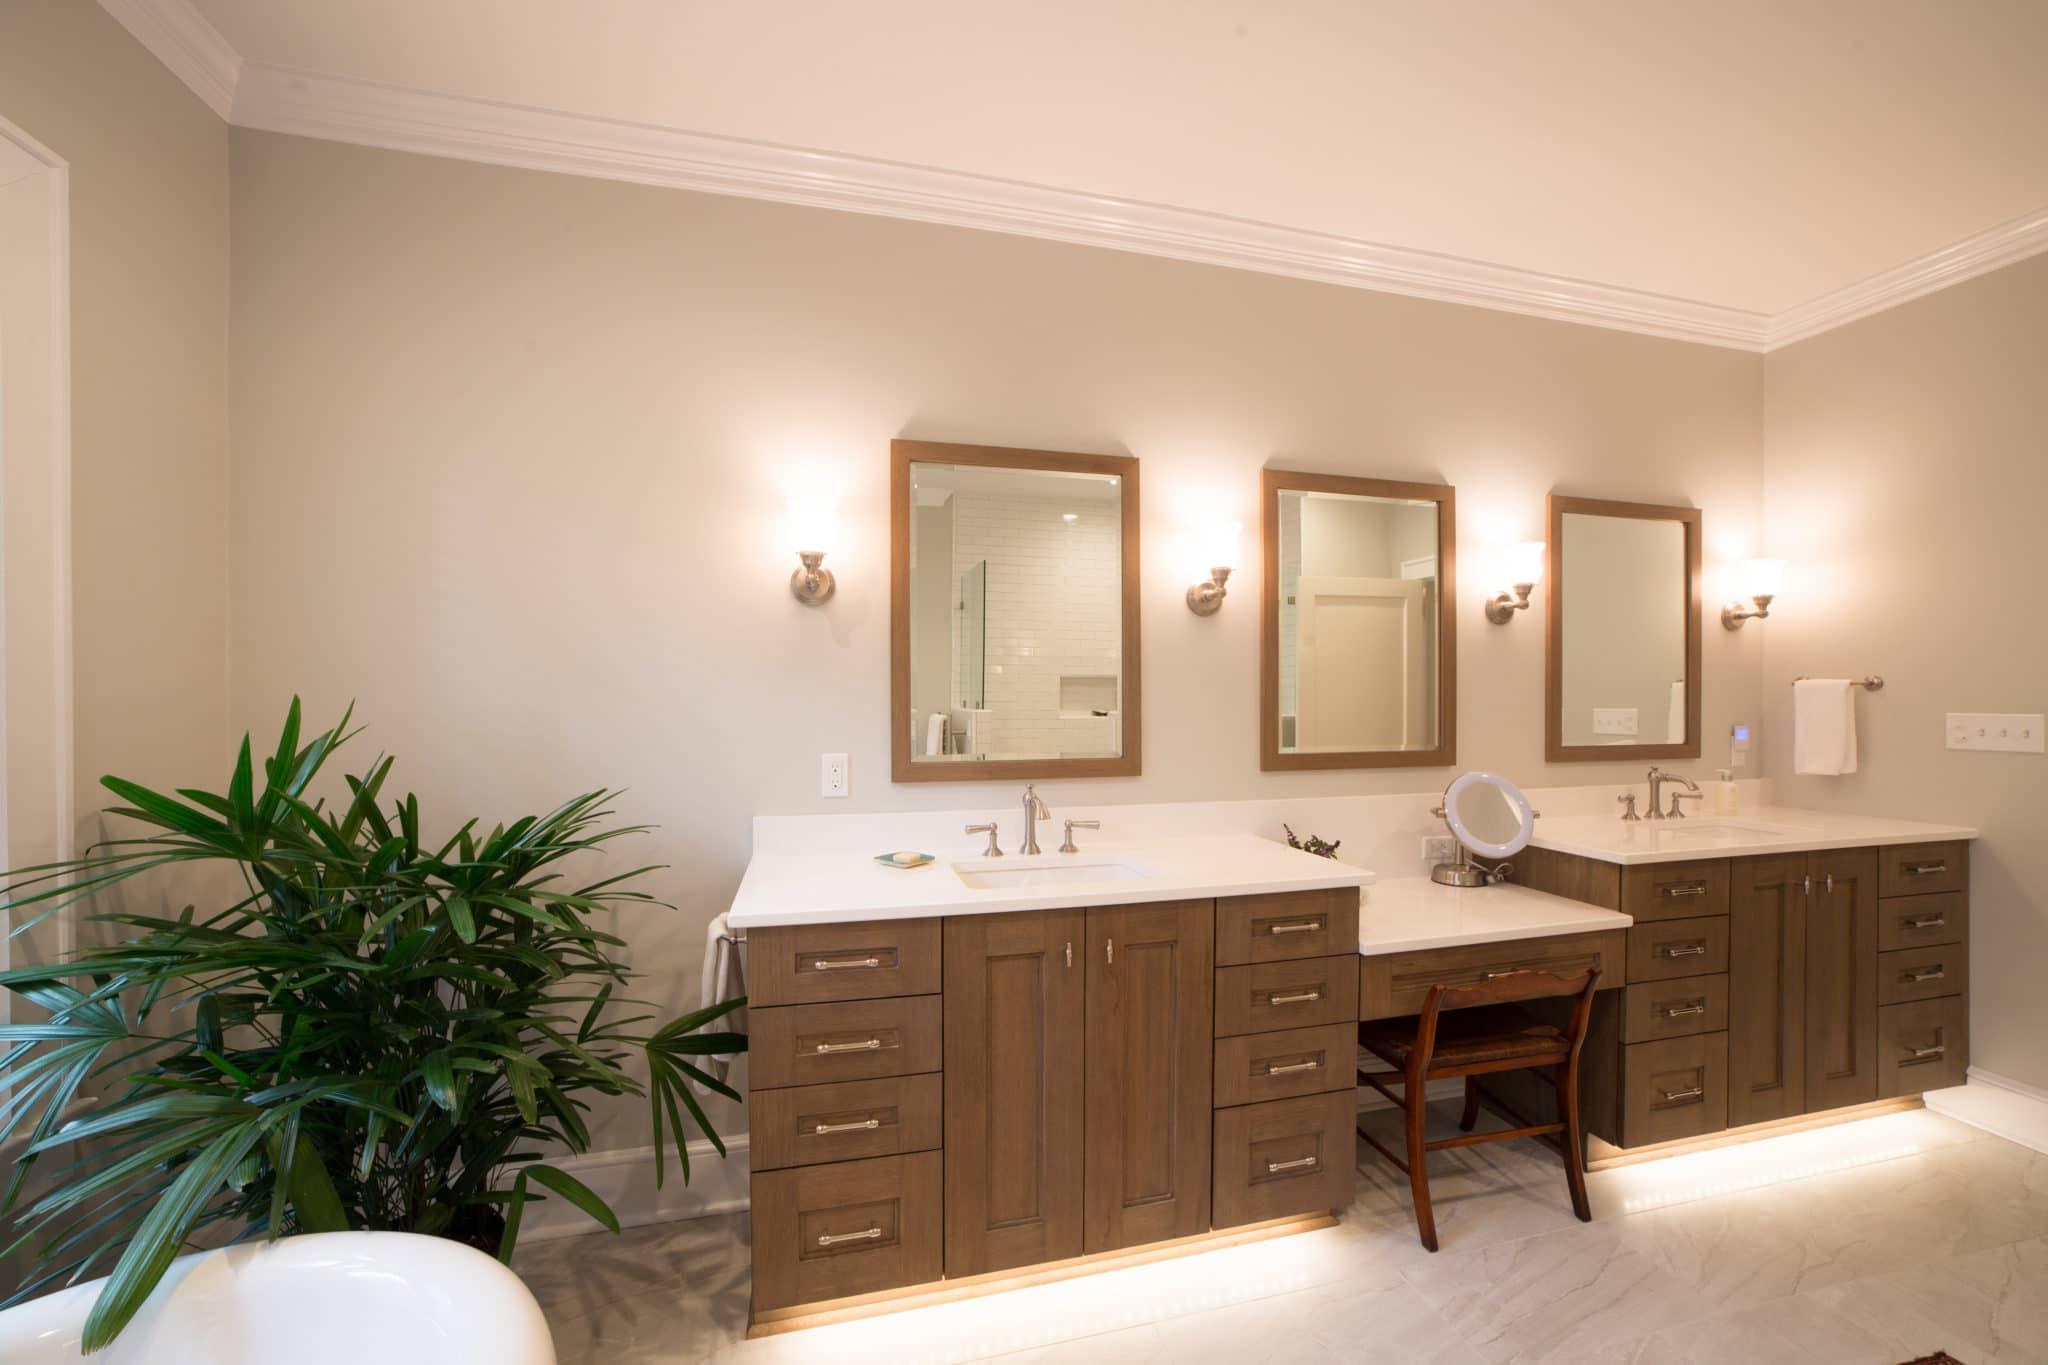 Remodeling contractor Bath Vanity